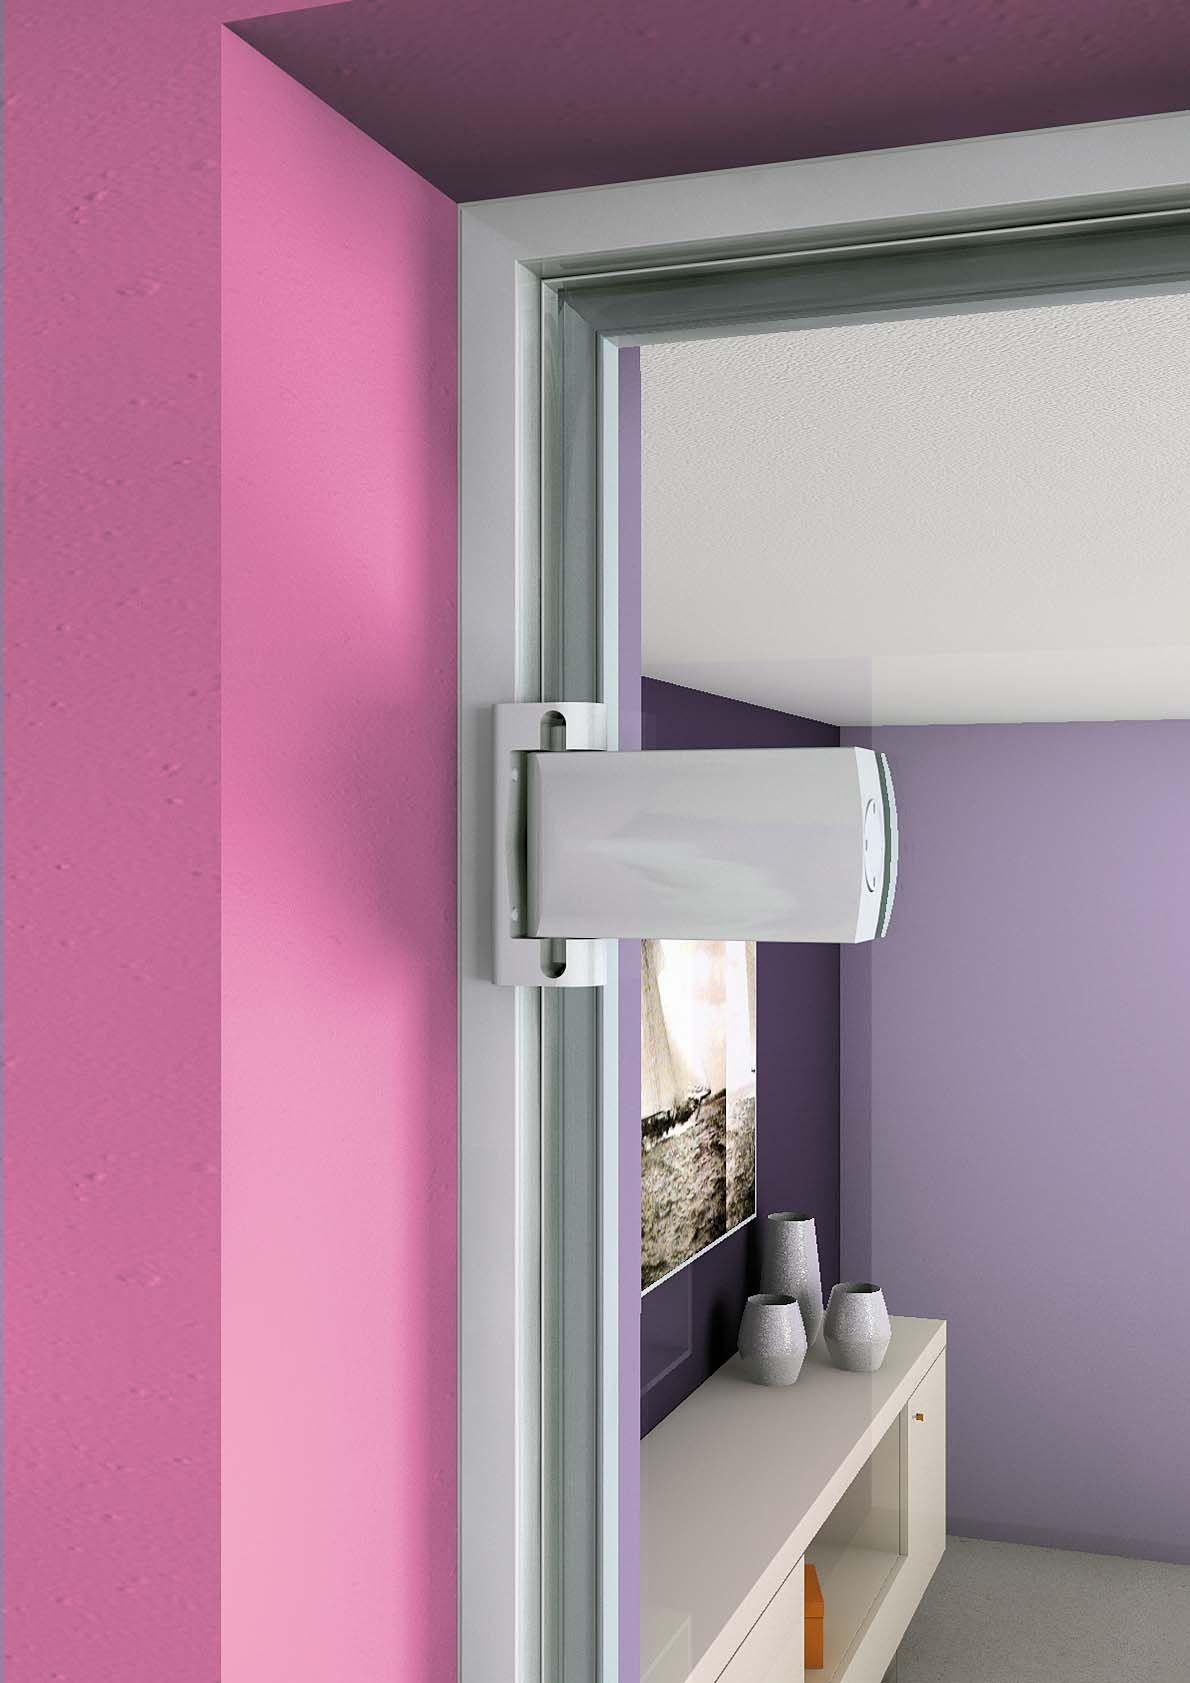 Biloba 8060 hinges for internal doors Colcom